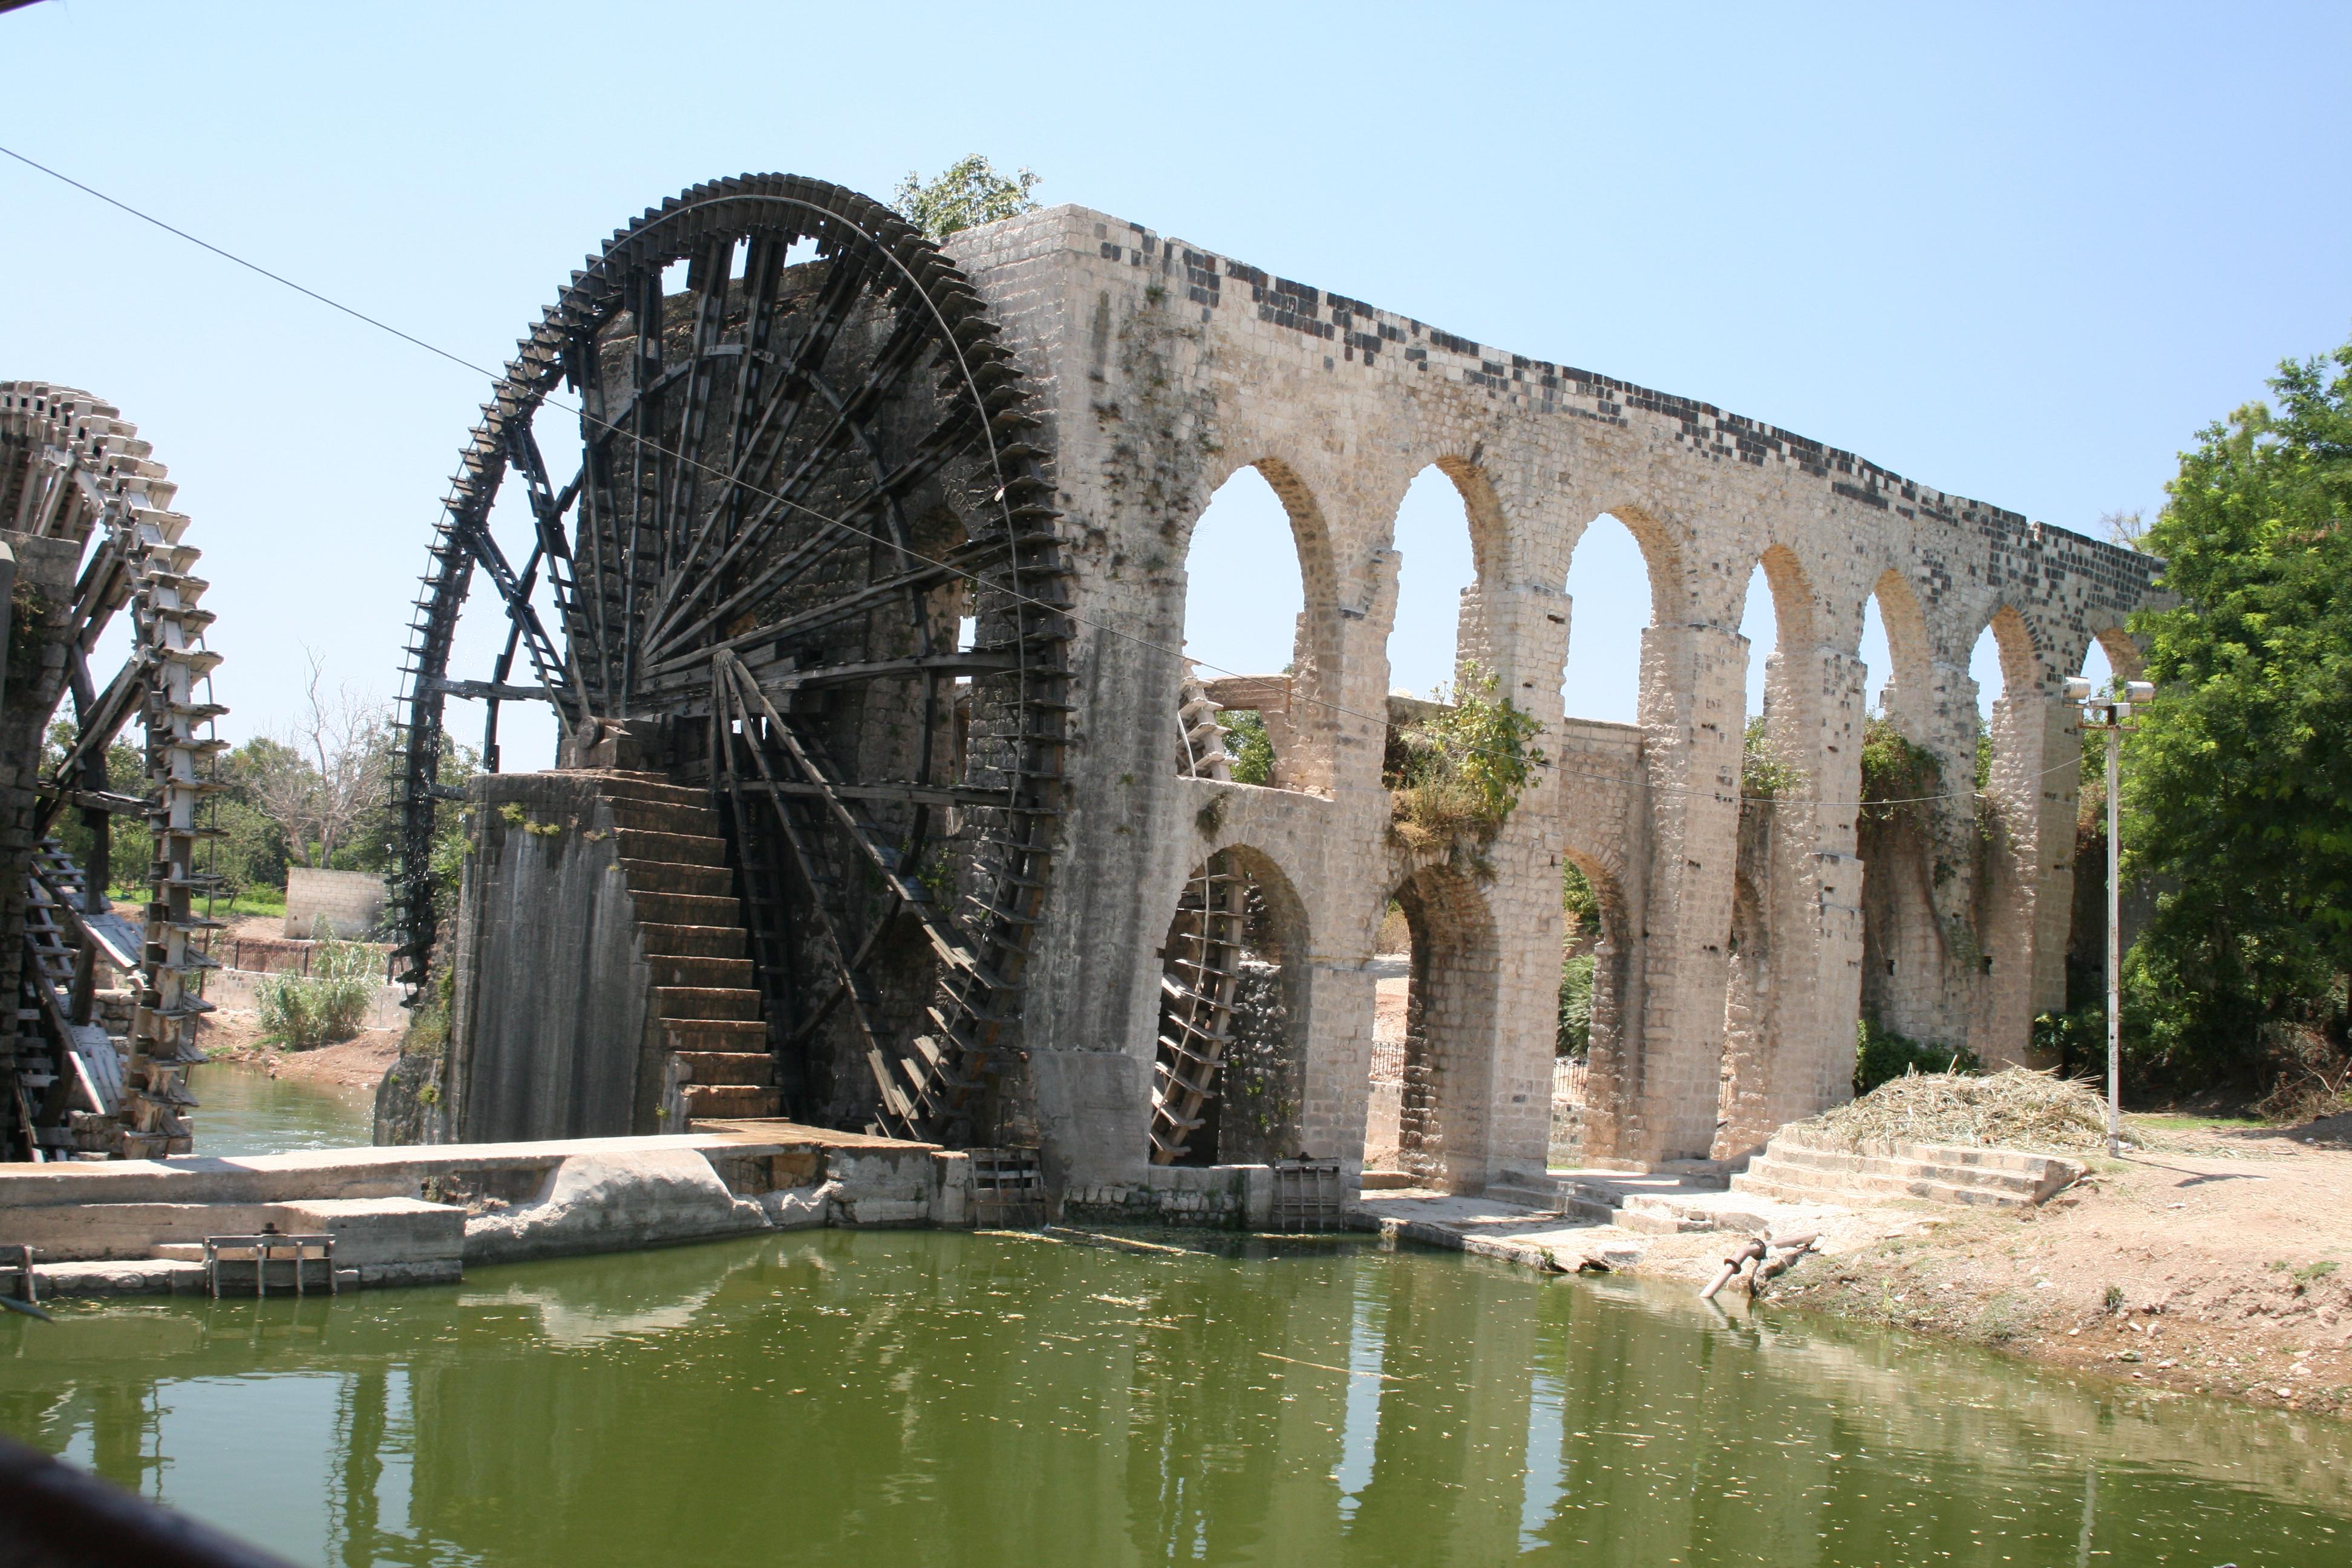 ancient water technology roman medieval waterwheel tools wheel noria wheels mill hama mesopotamia triumphs aqueduct rome syria failures resource middle